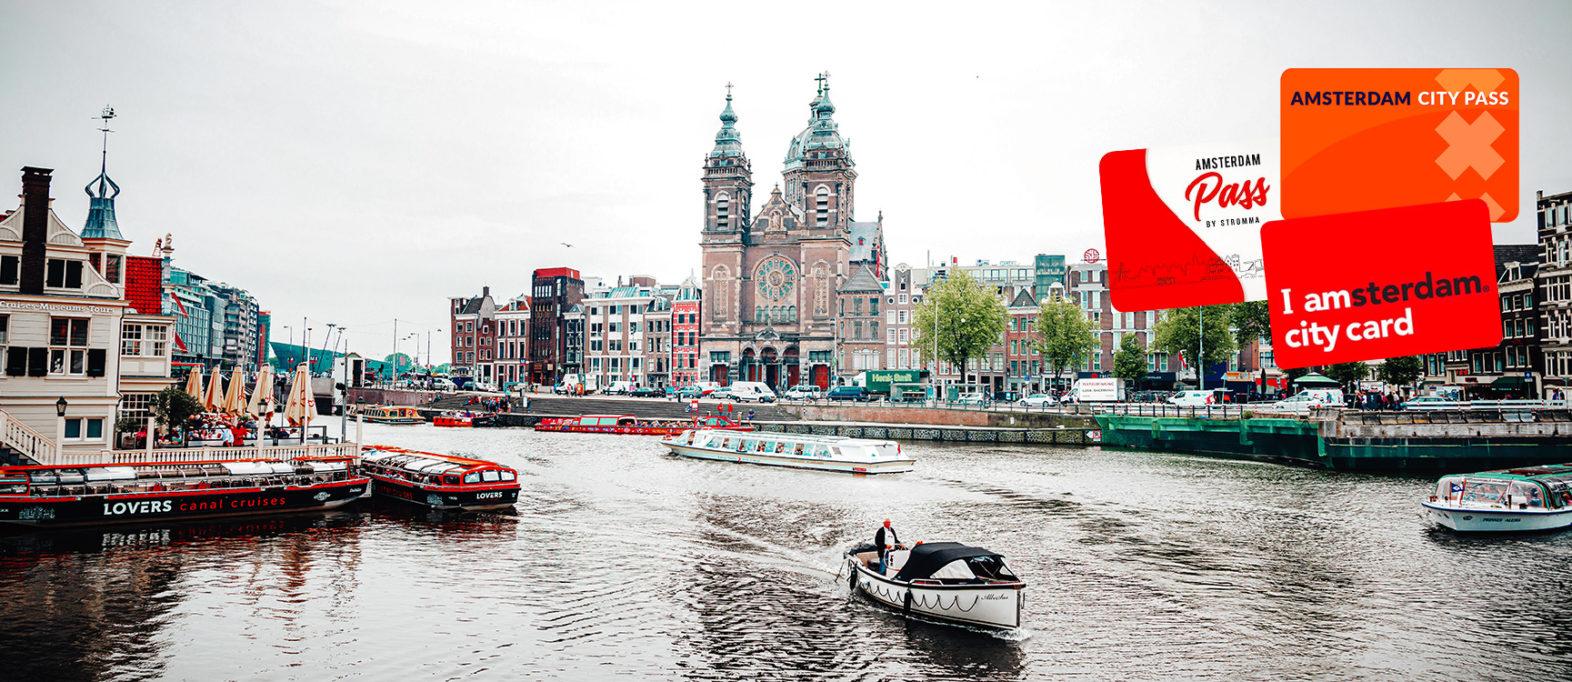 Amsterdam City Card Vergleich